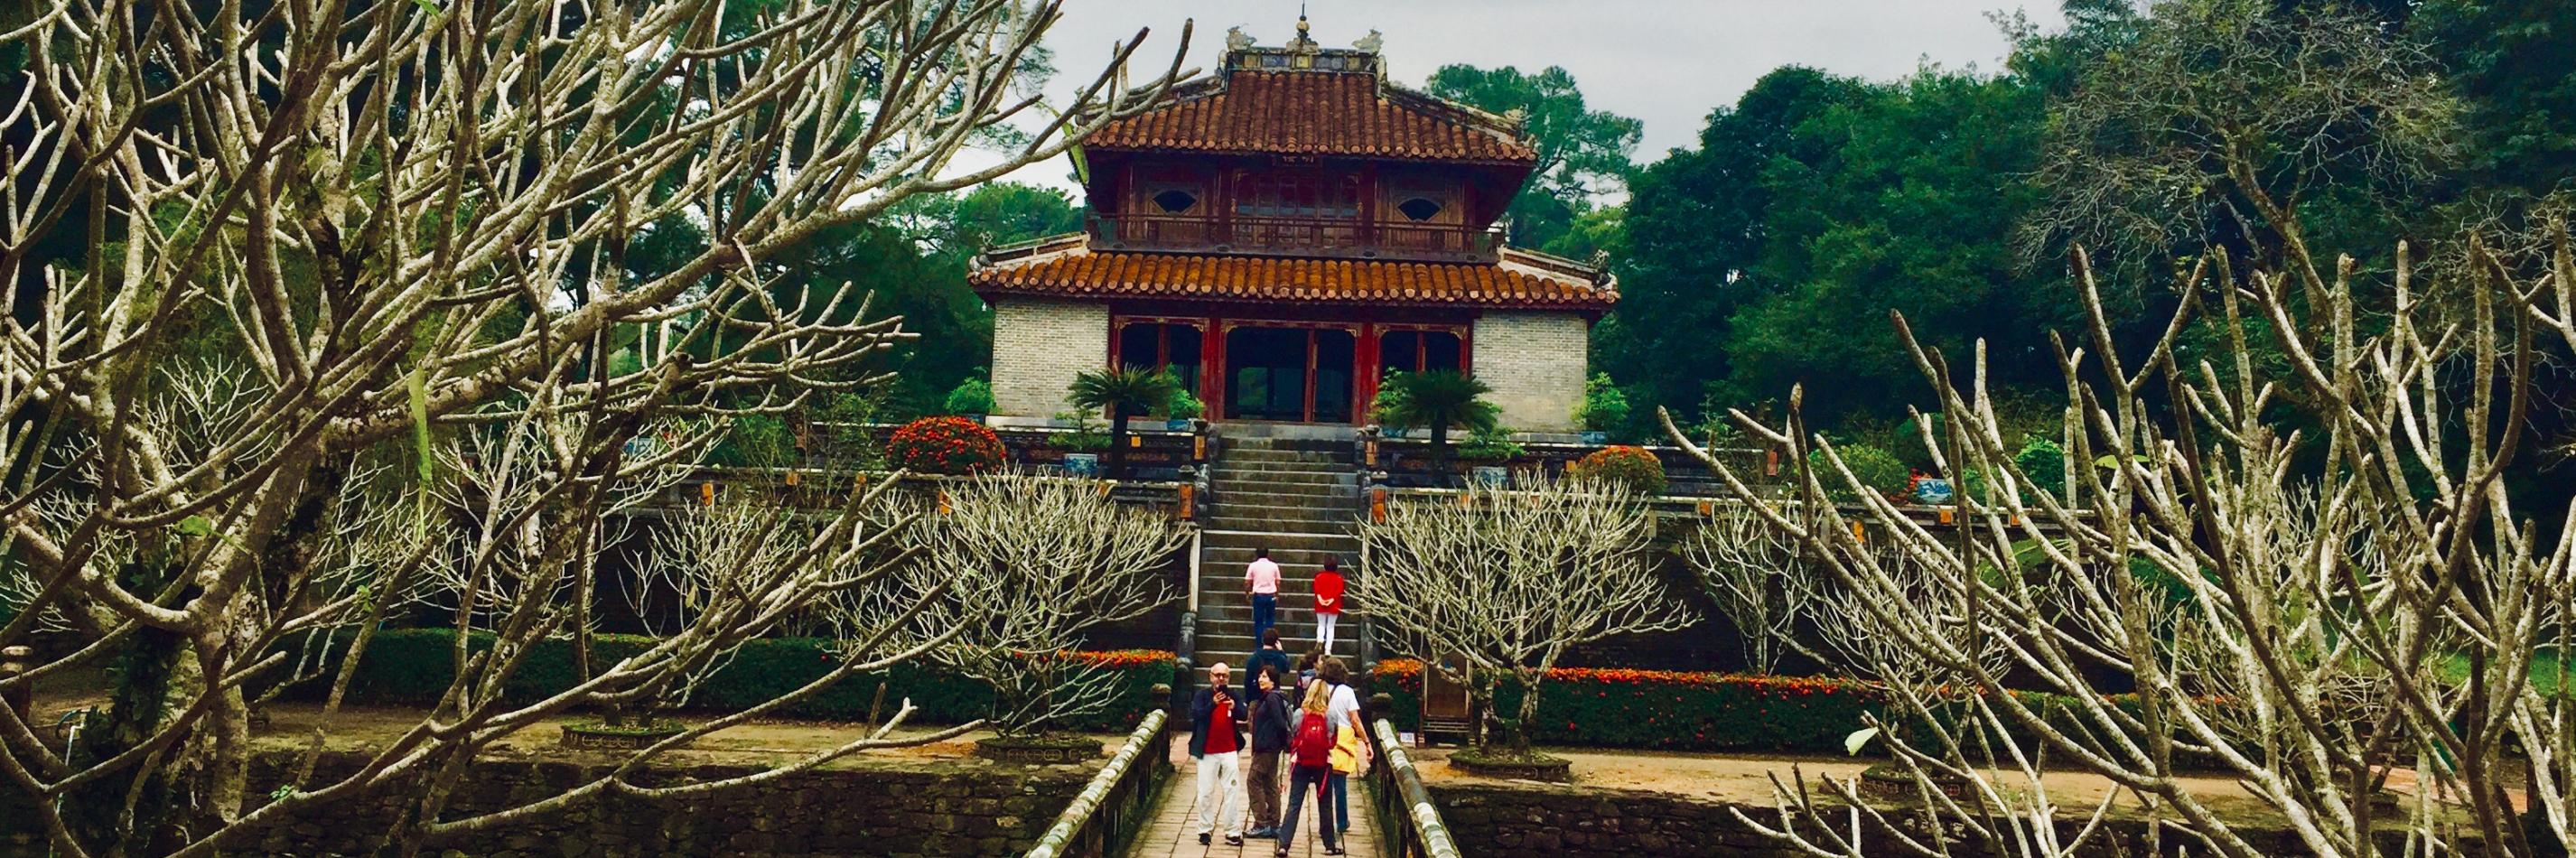 https://gody.vn/blog/olipnoi4502/post/lang-vua-minh-mang-dia-diem-mang-hoi-tho-cua-lich-su-7611